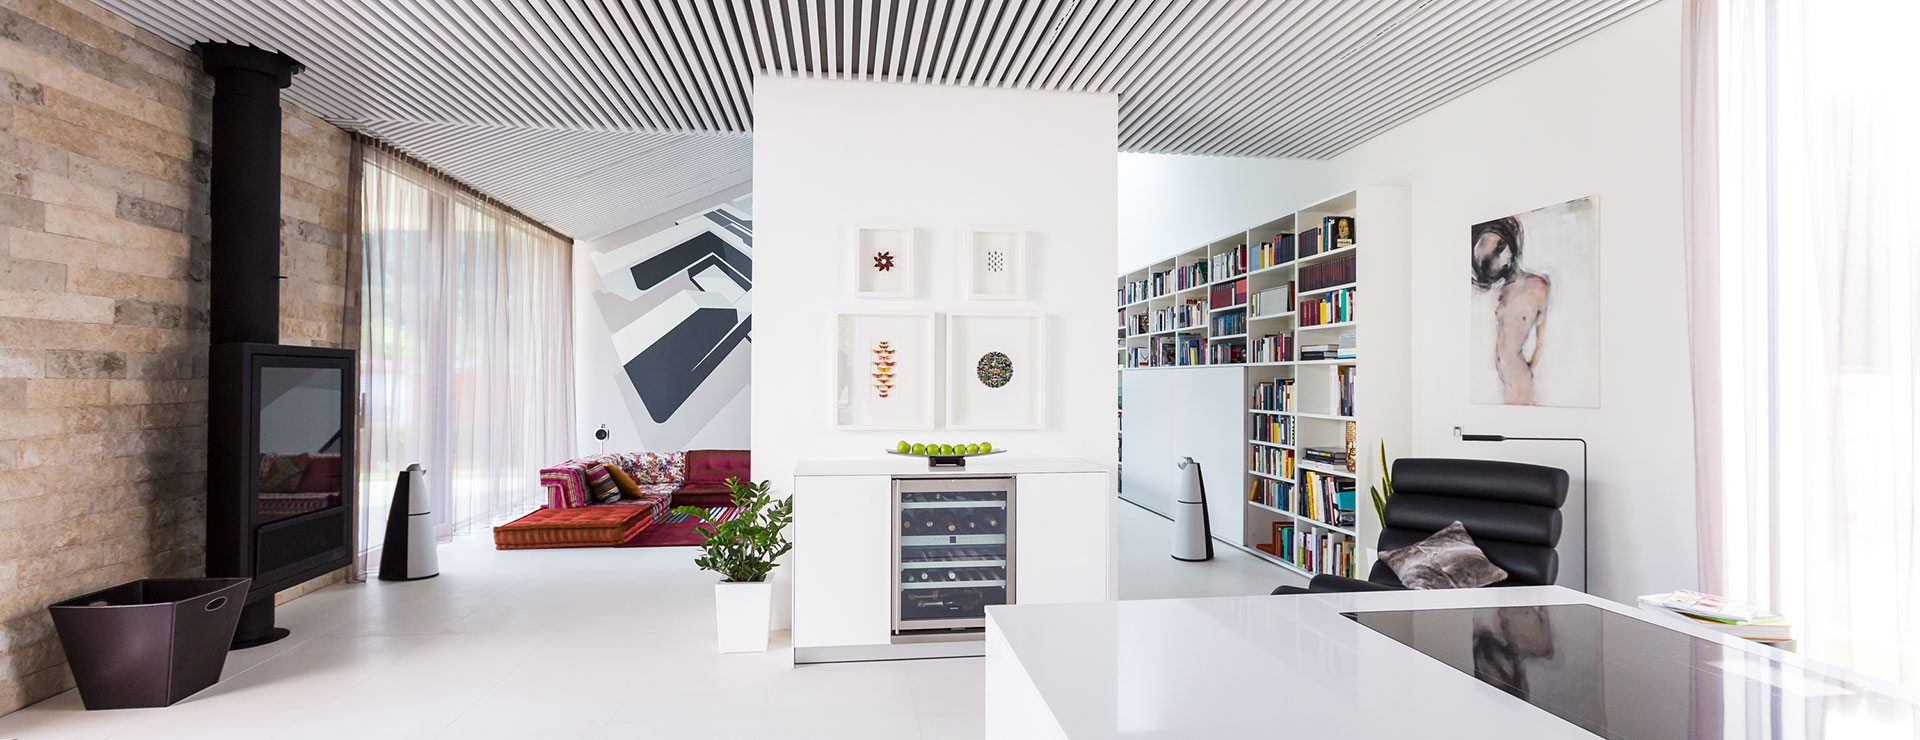 Luxus-Ferienhaus mieten, Design Ferienhaus in Kärnten, Millstätter See